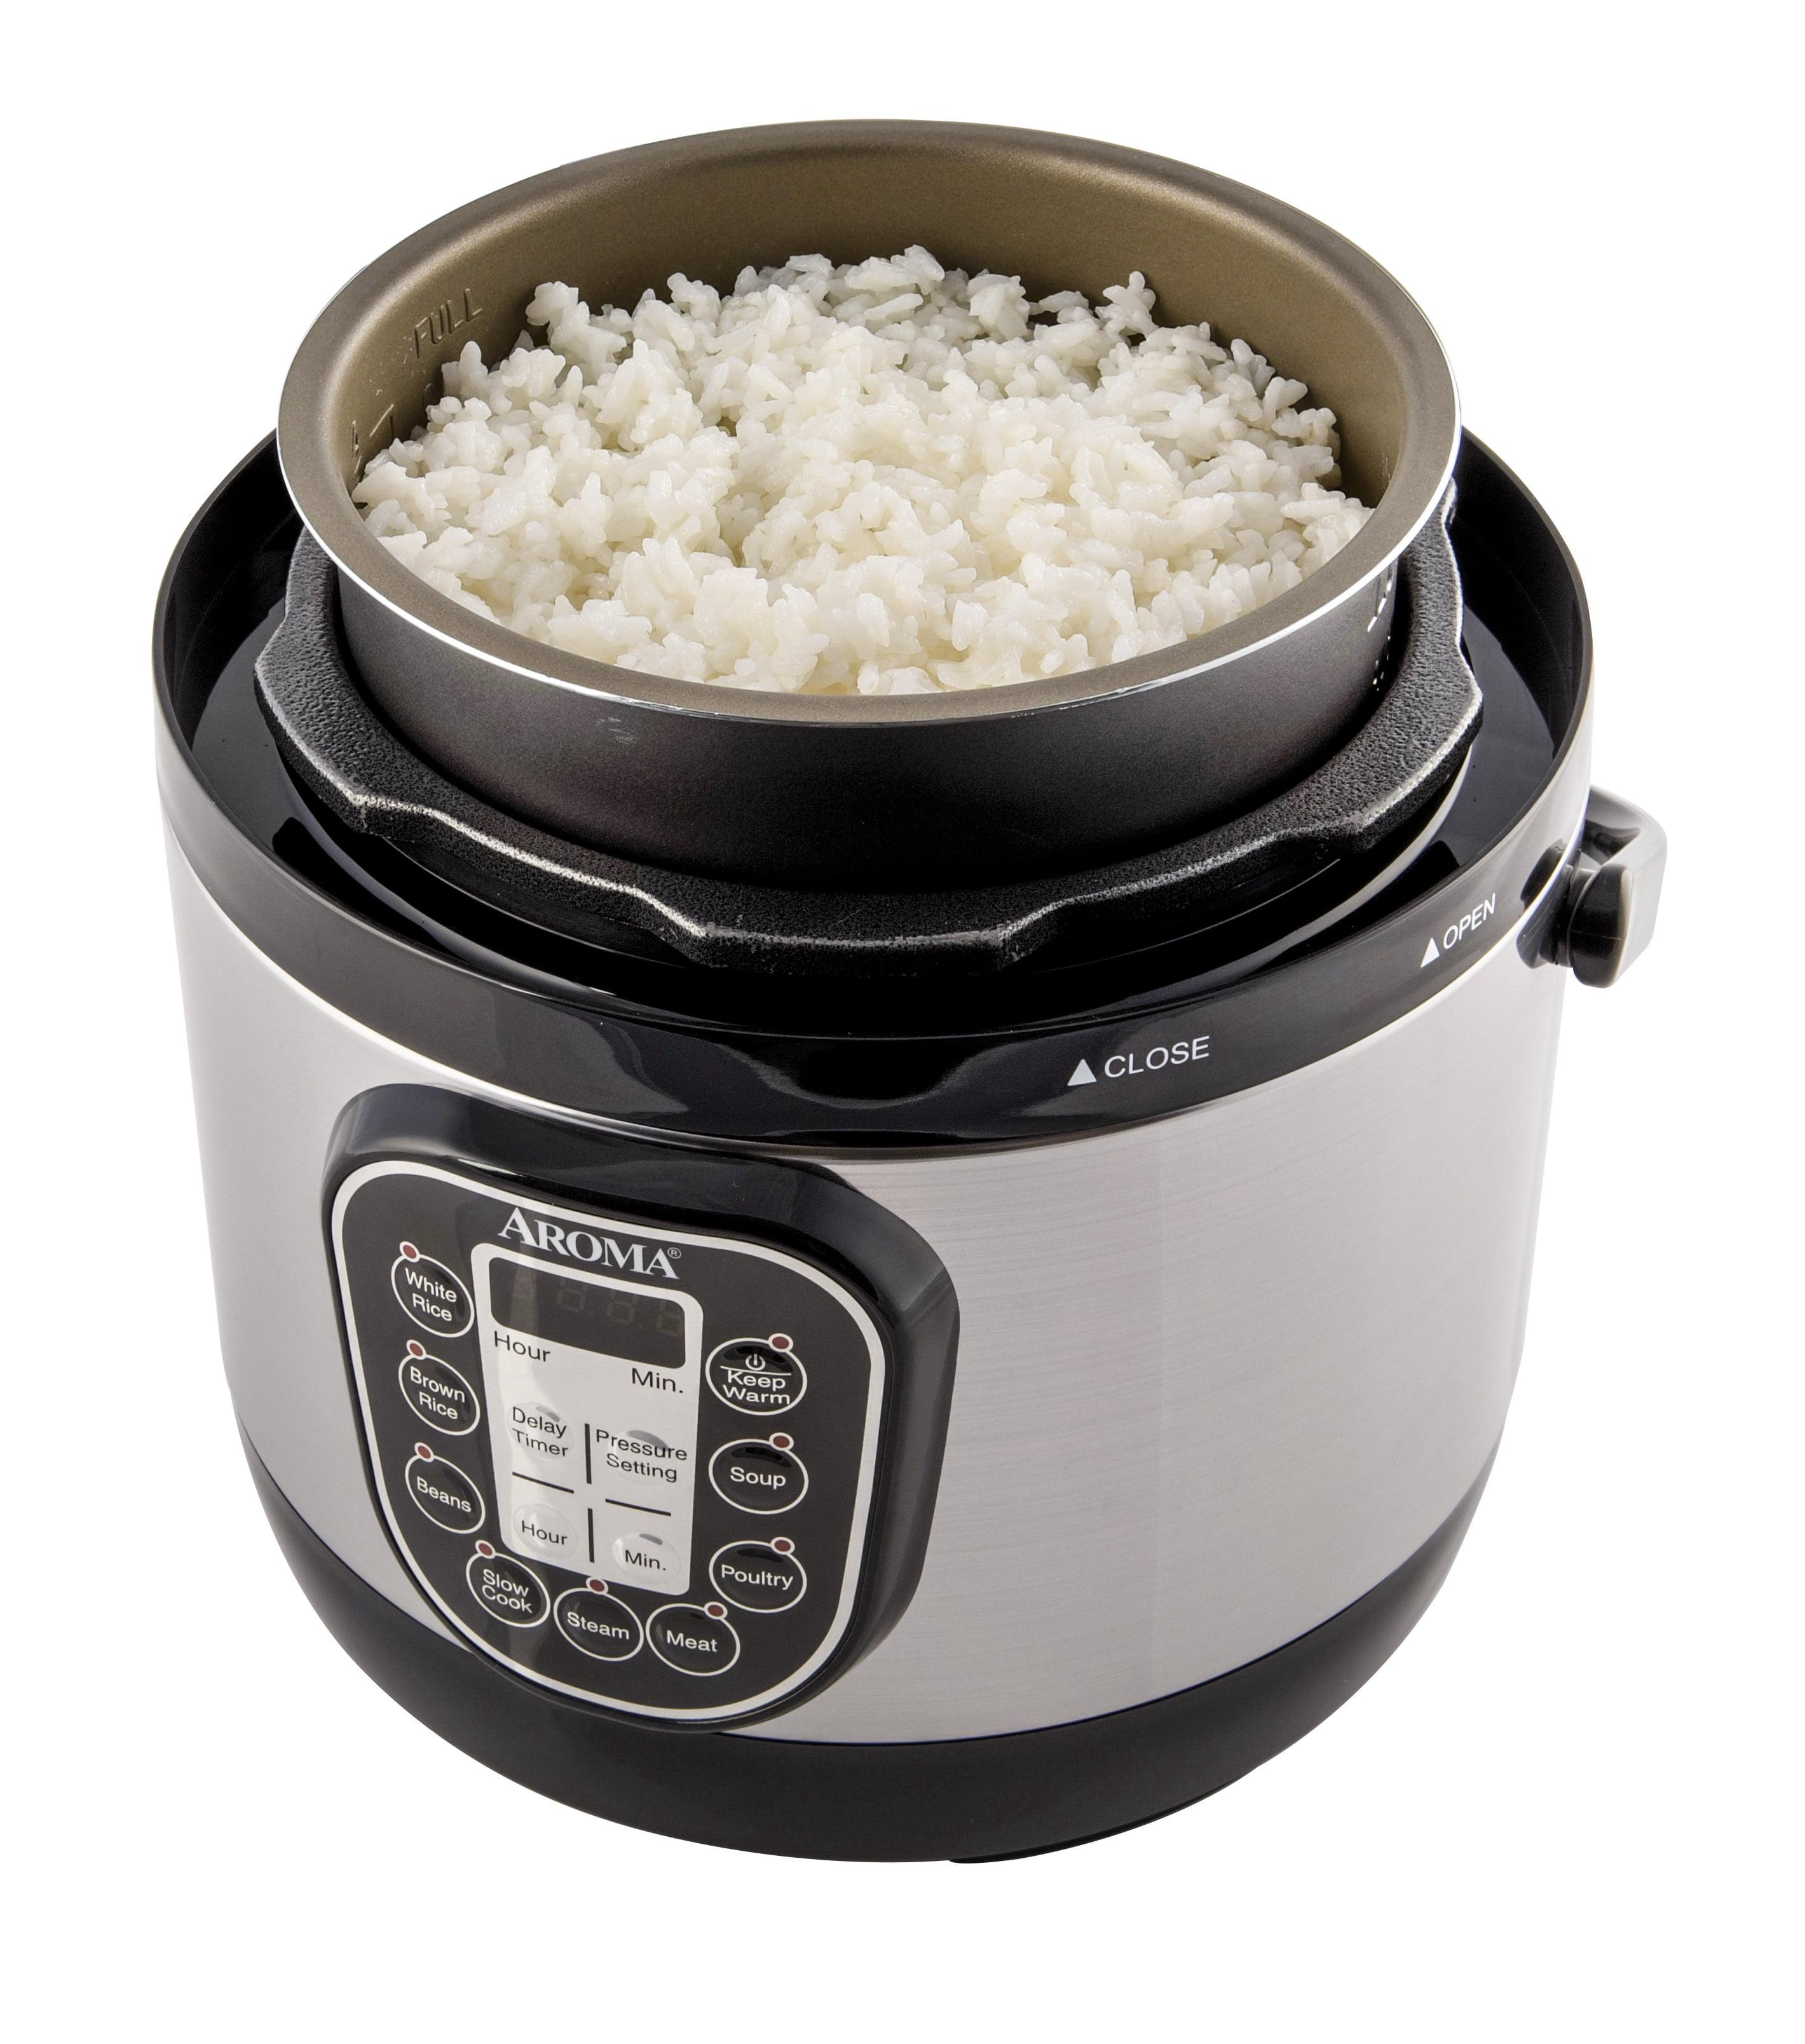 Aroma 2 liter digital turbo pressure cooker walmart ccuart Images